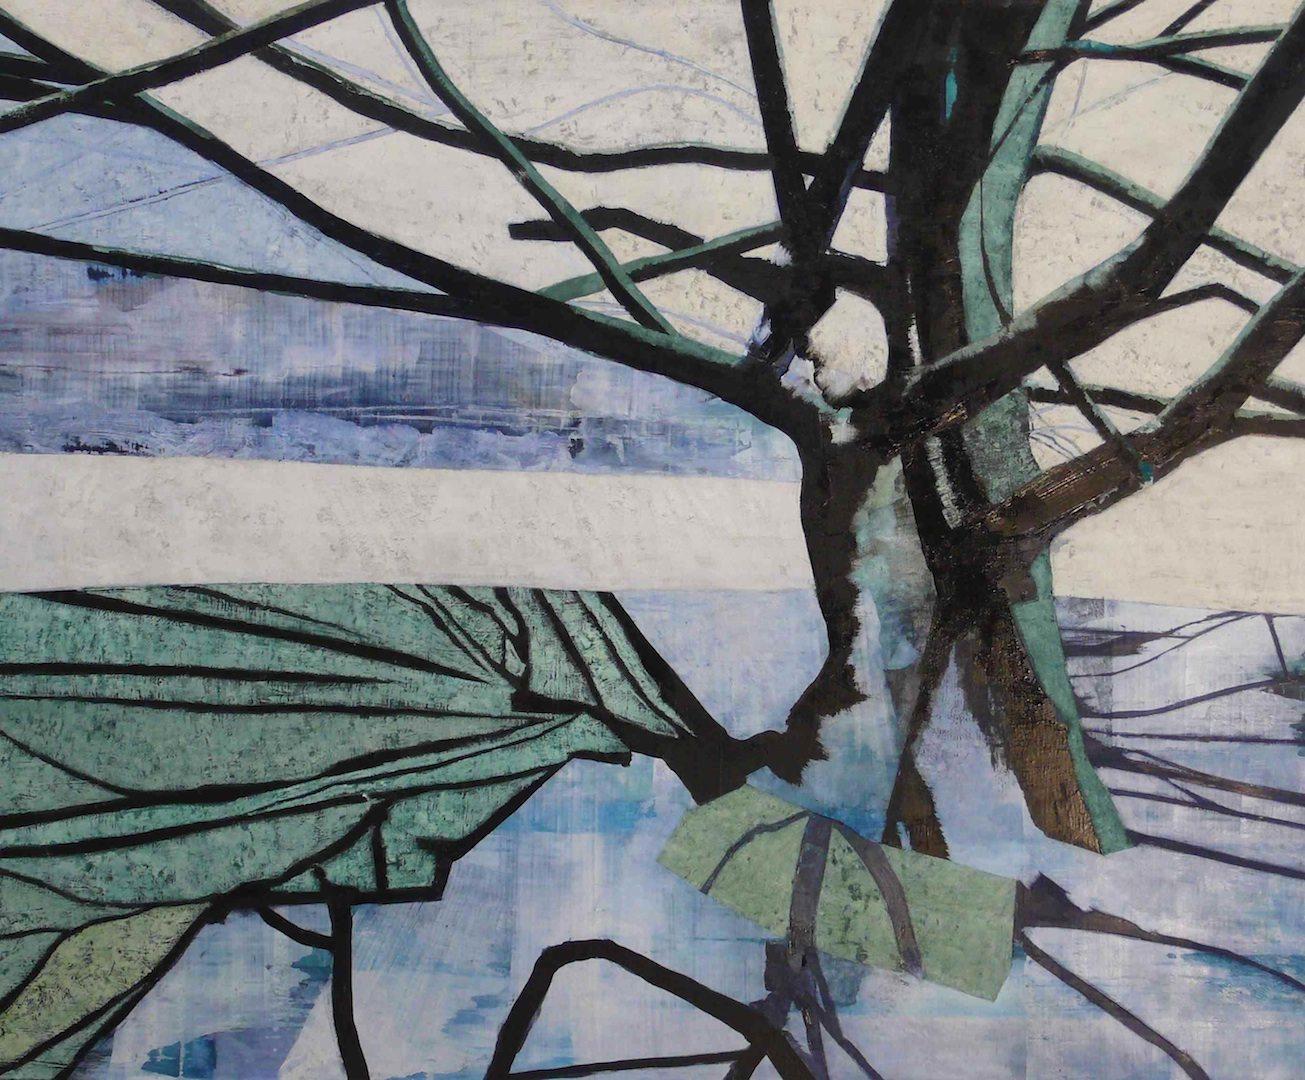 'Hampstead Tree' - Oil on Canvas, 148x178cm, 2014 - Zoe Benbow